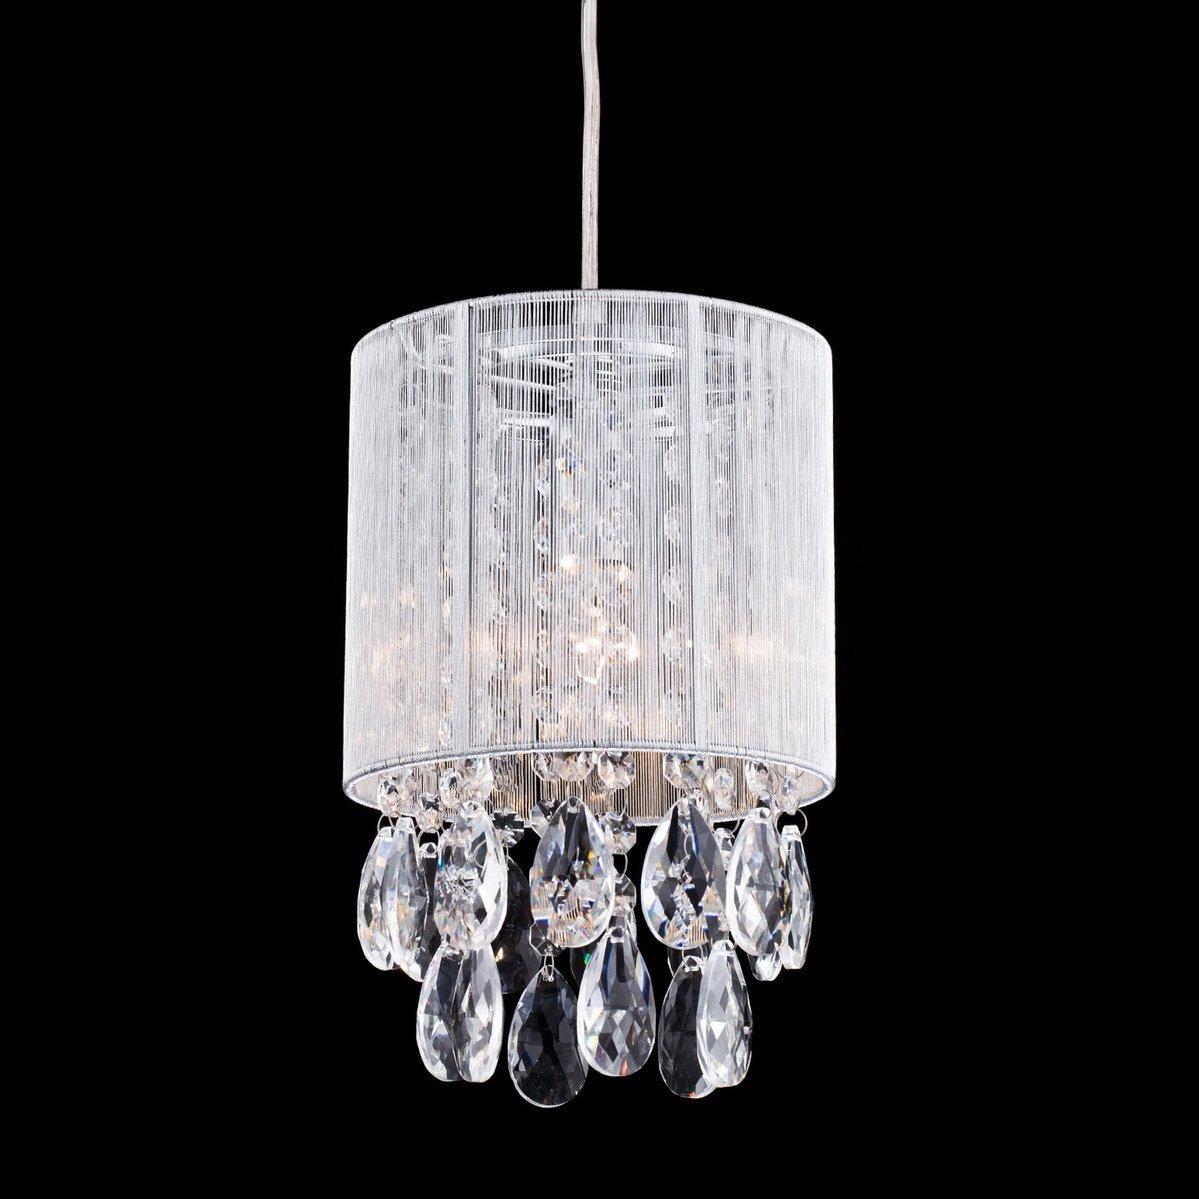 Dazhuan Modern Crystal Drops Pendant Ceiling Lighting Chandelier Lamp Hanging Light